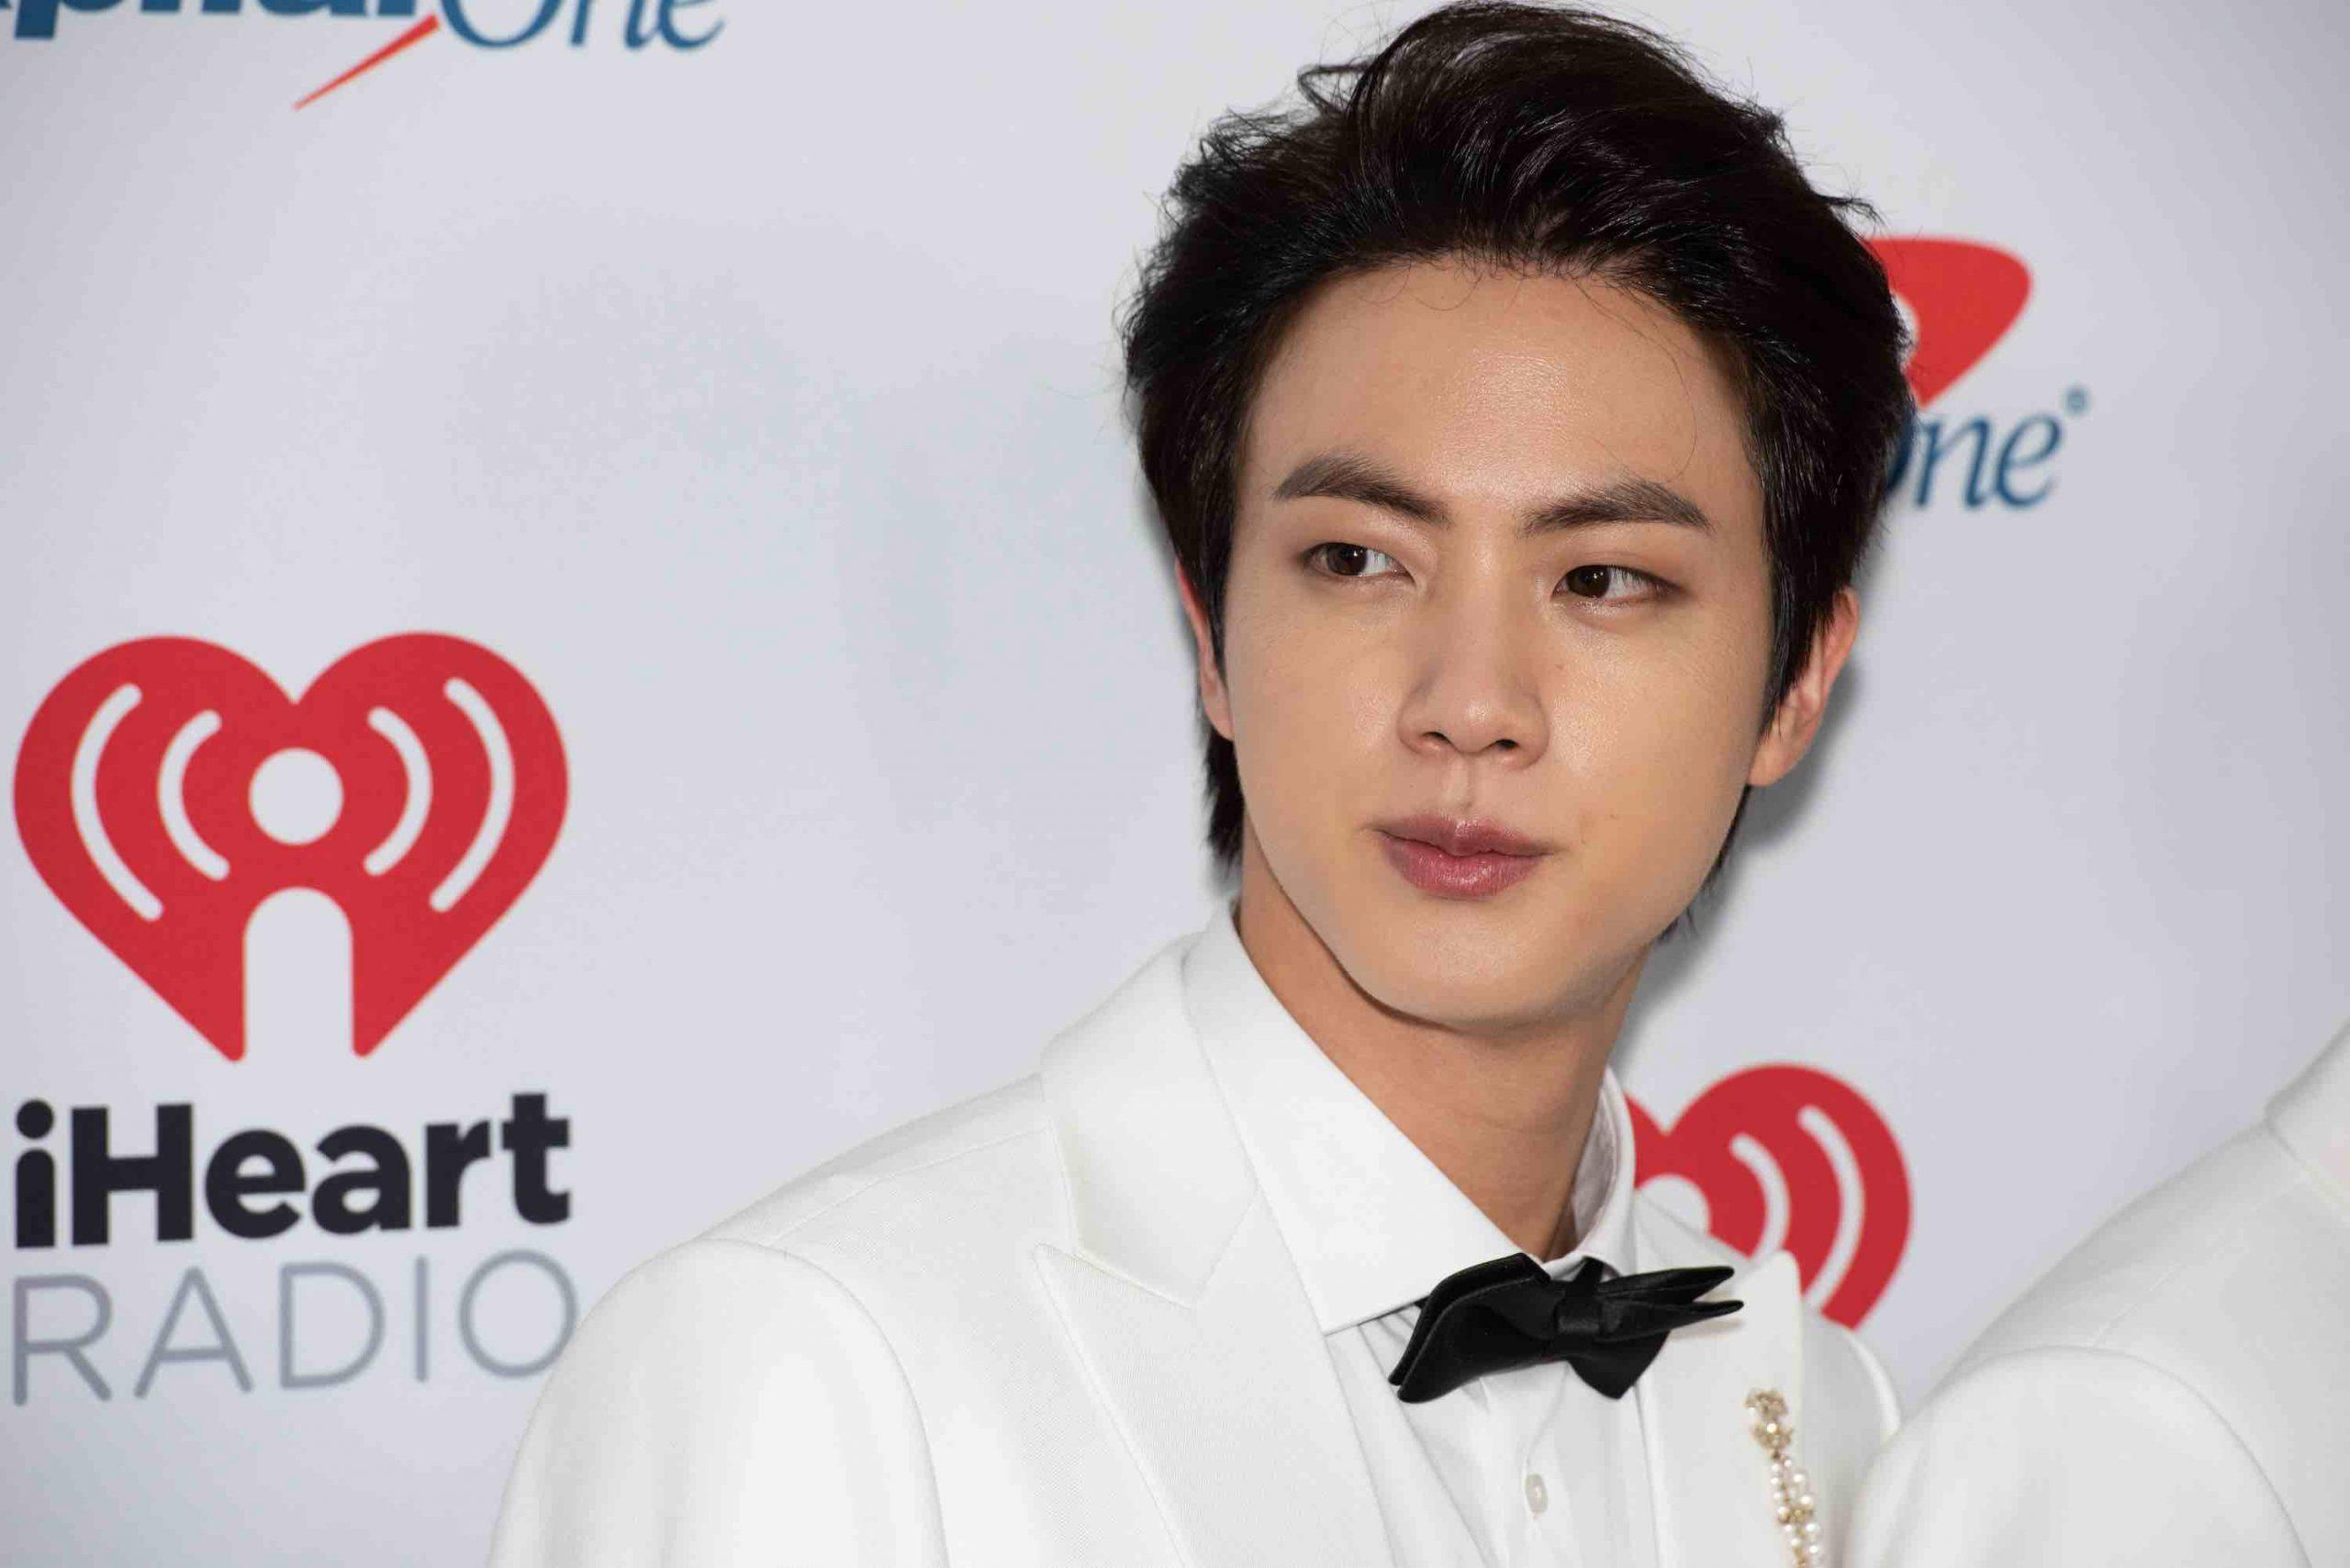 BTS K-Pop group and fans donation to Black Lives Matter